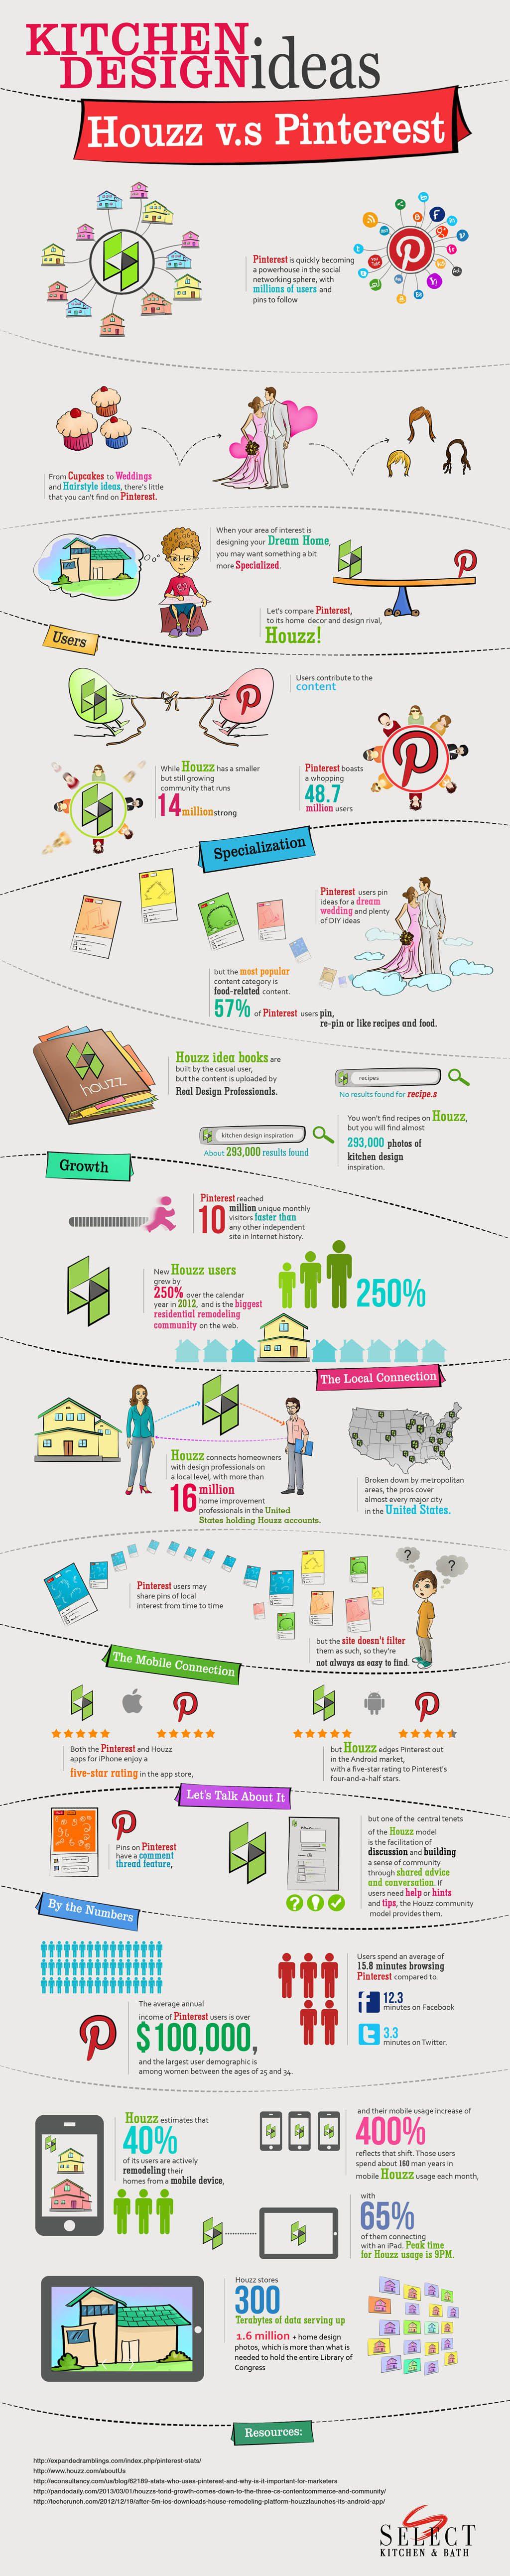 infographic kitchen design ideas houzz vs pinterest select kitchen design Embed This